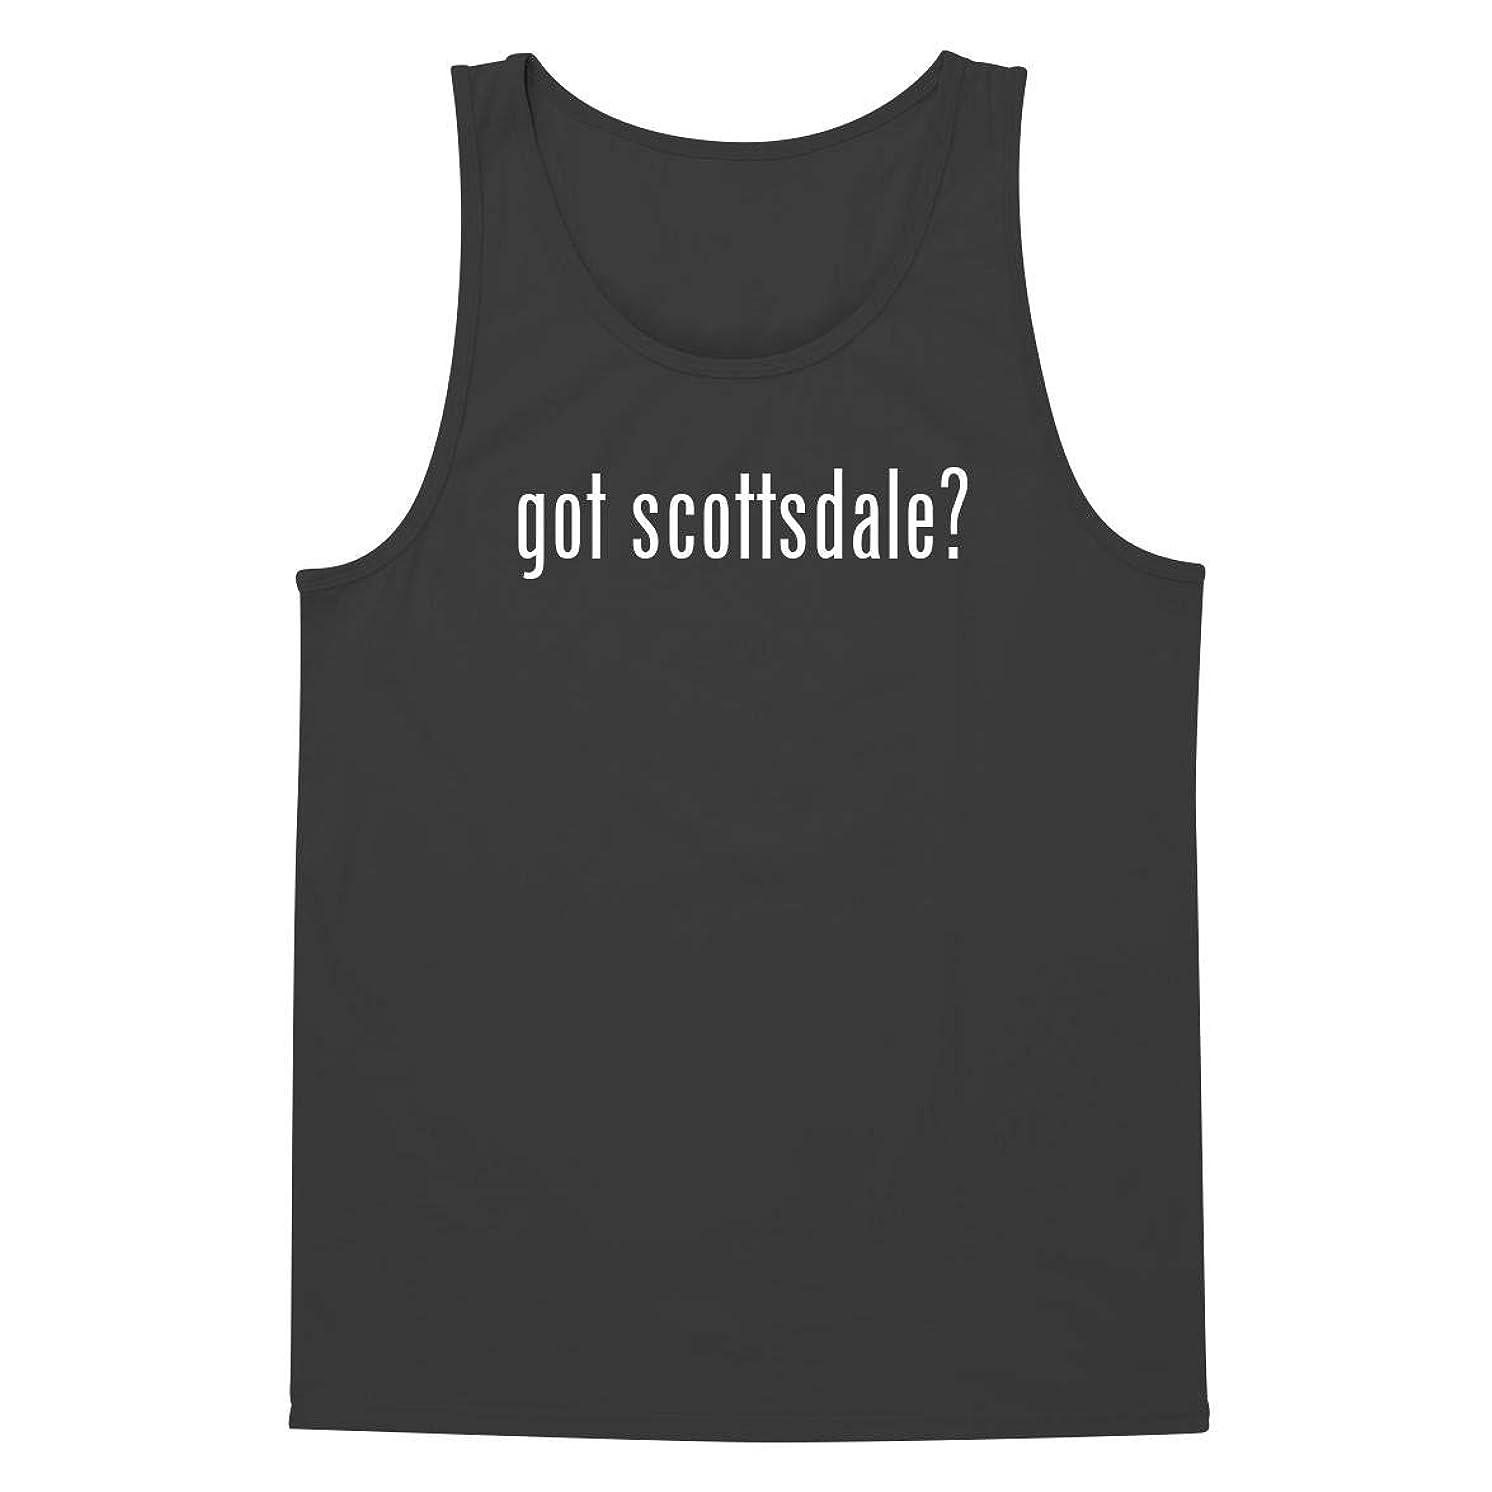 The Town Butler got Scottsdale? - A Soft & Comfortable Unisex Men's & Women's Tank Top